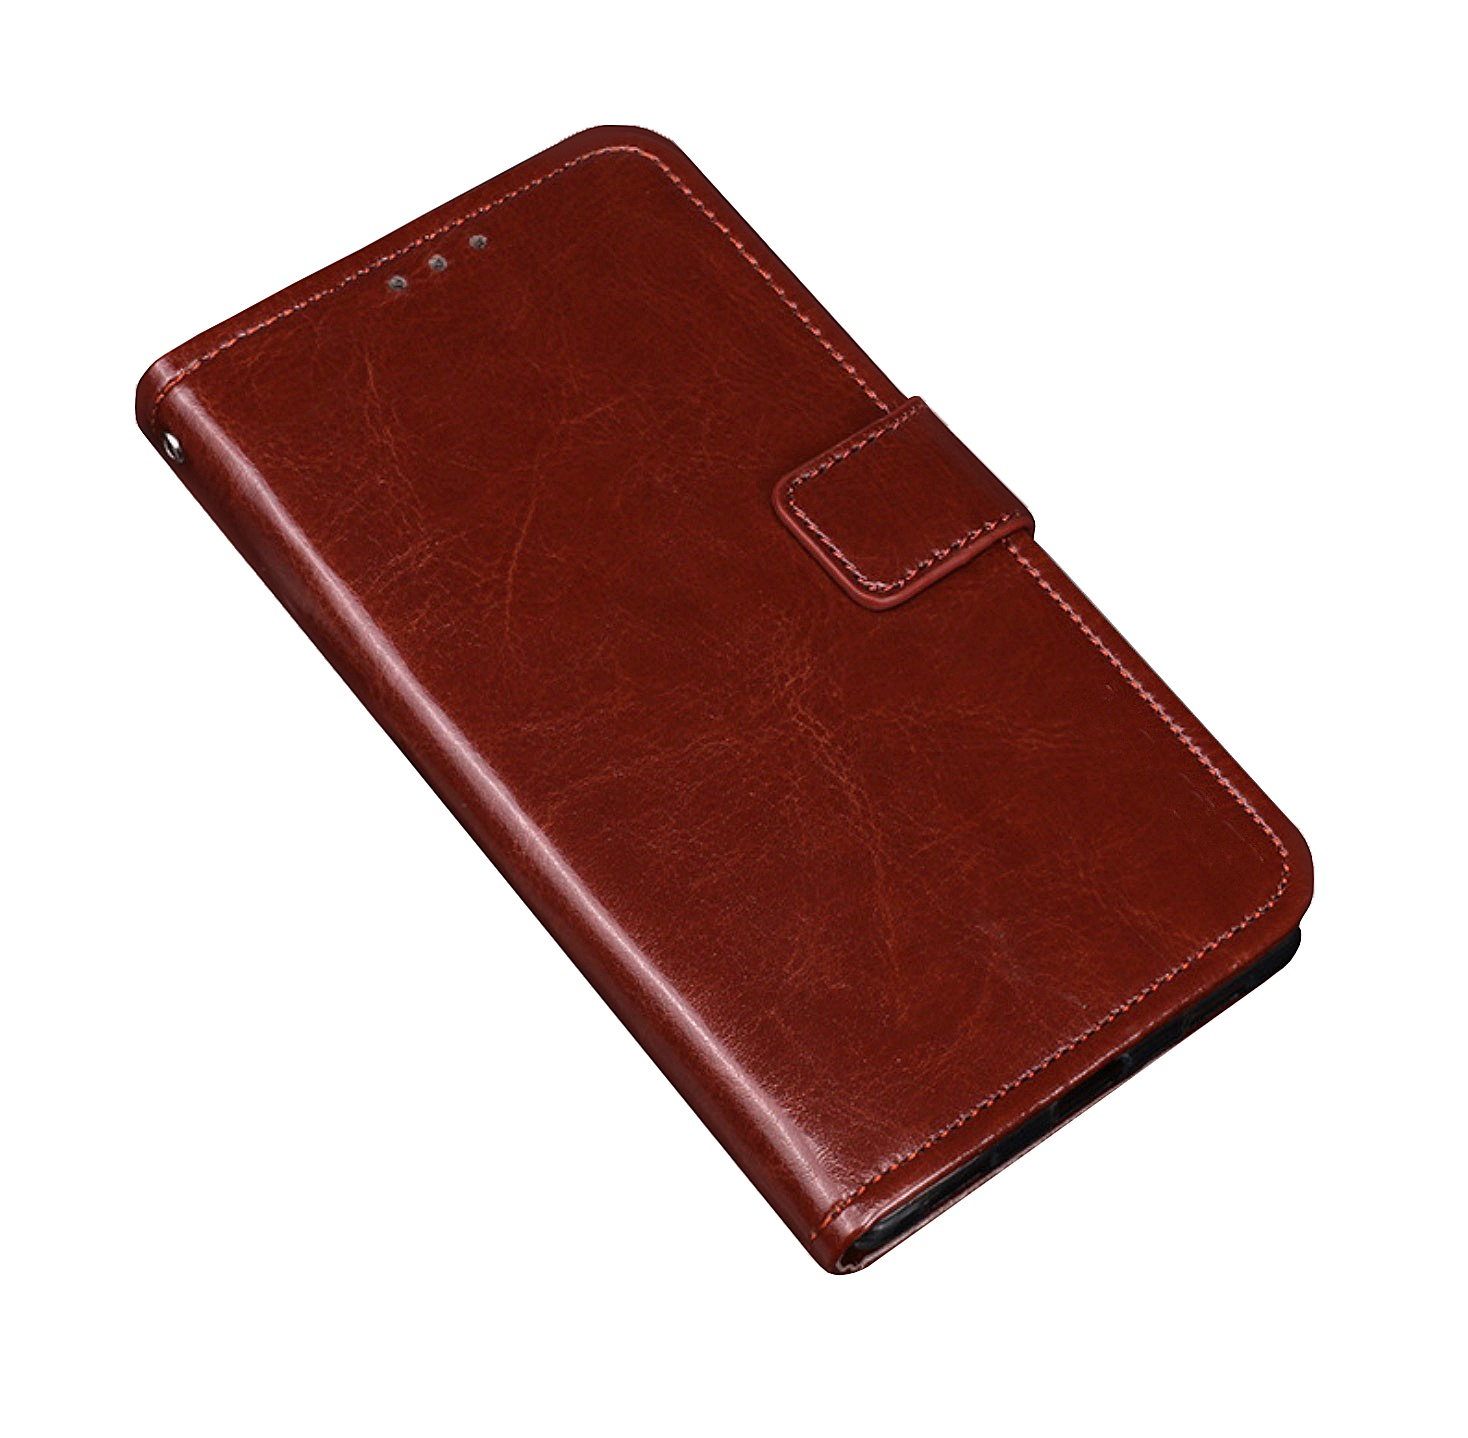 Чехол MyPads для ZTE Nubia Z9 Mini с мульти-подставкой застёжкой и визитницей коричневый цена и фото